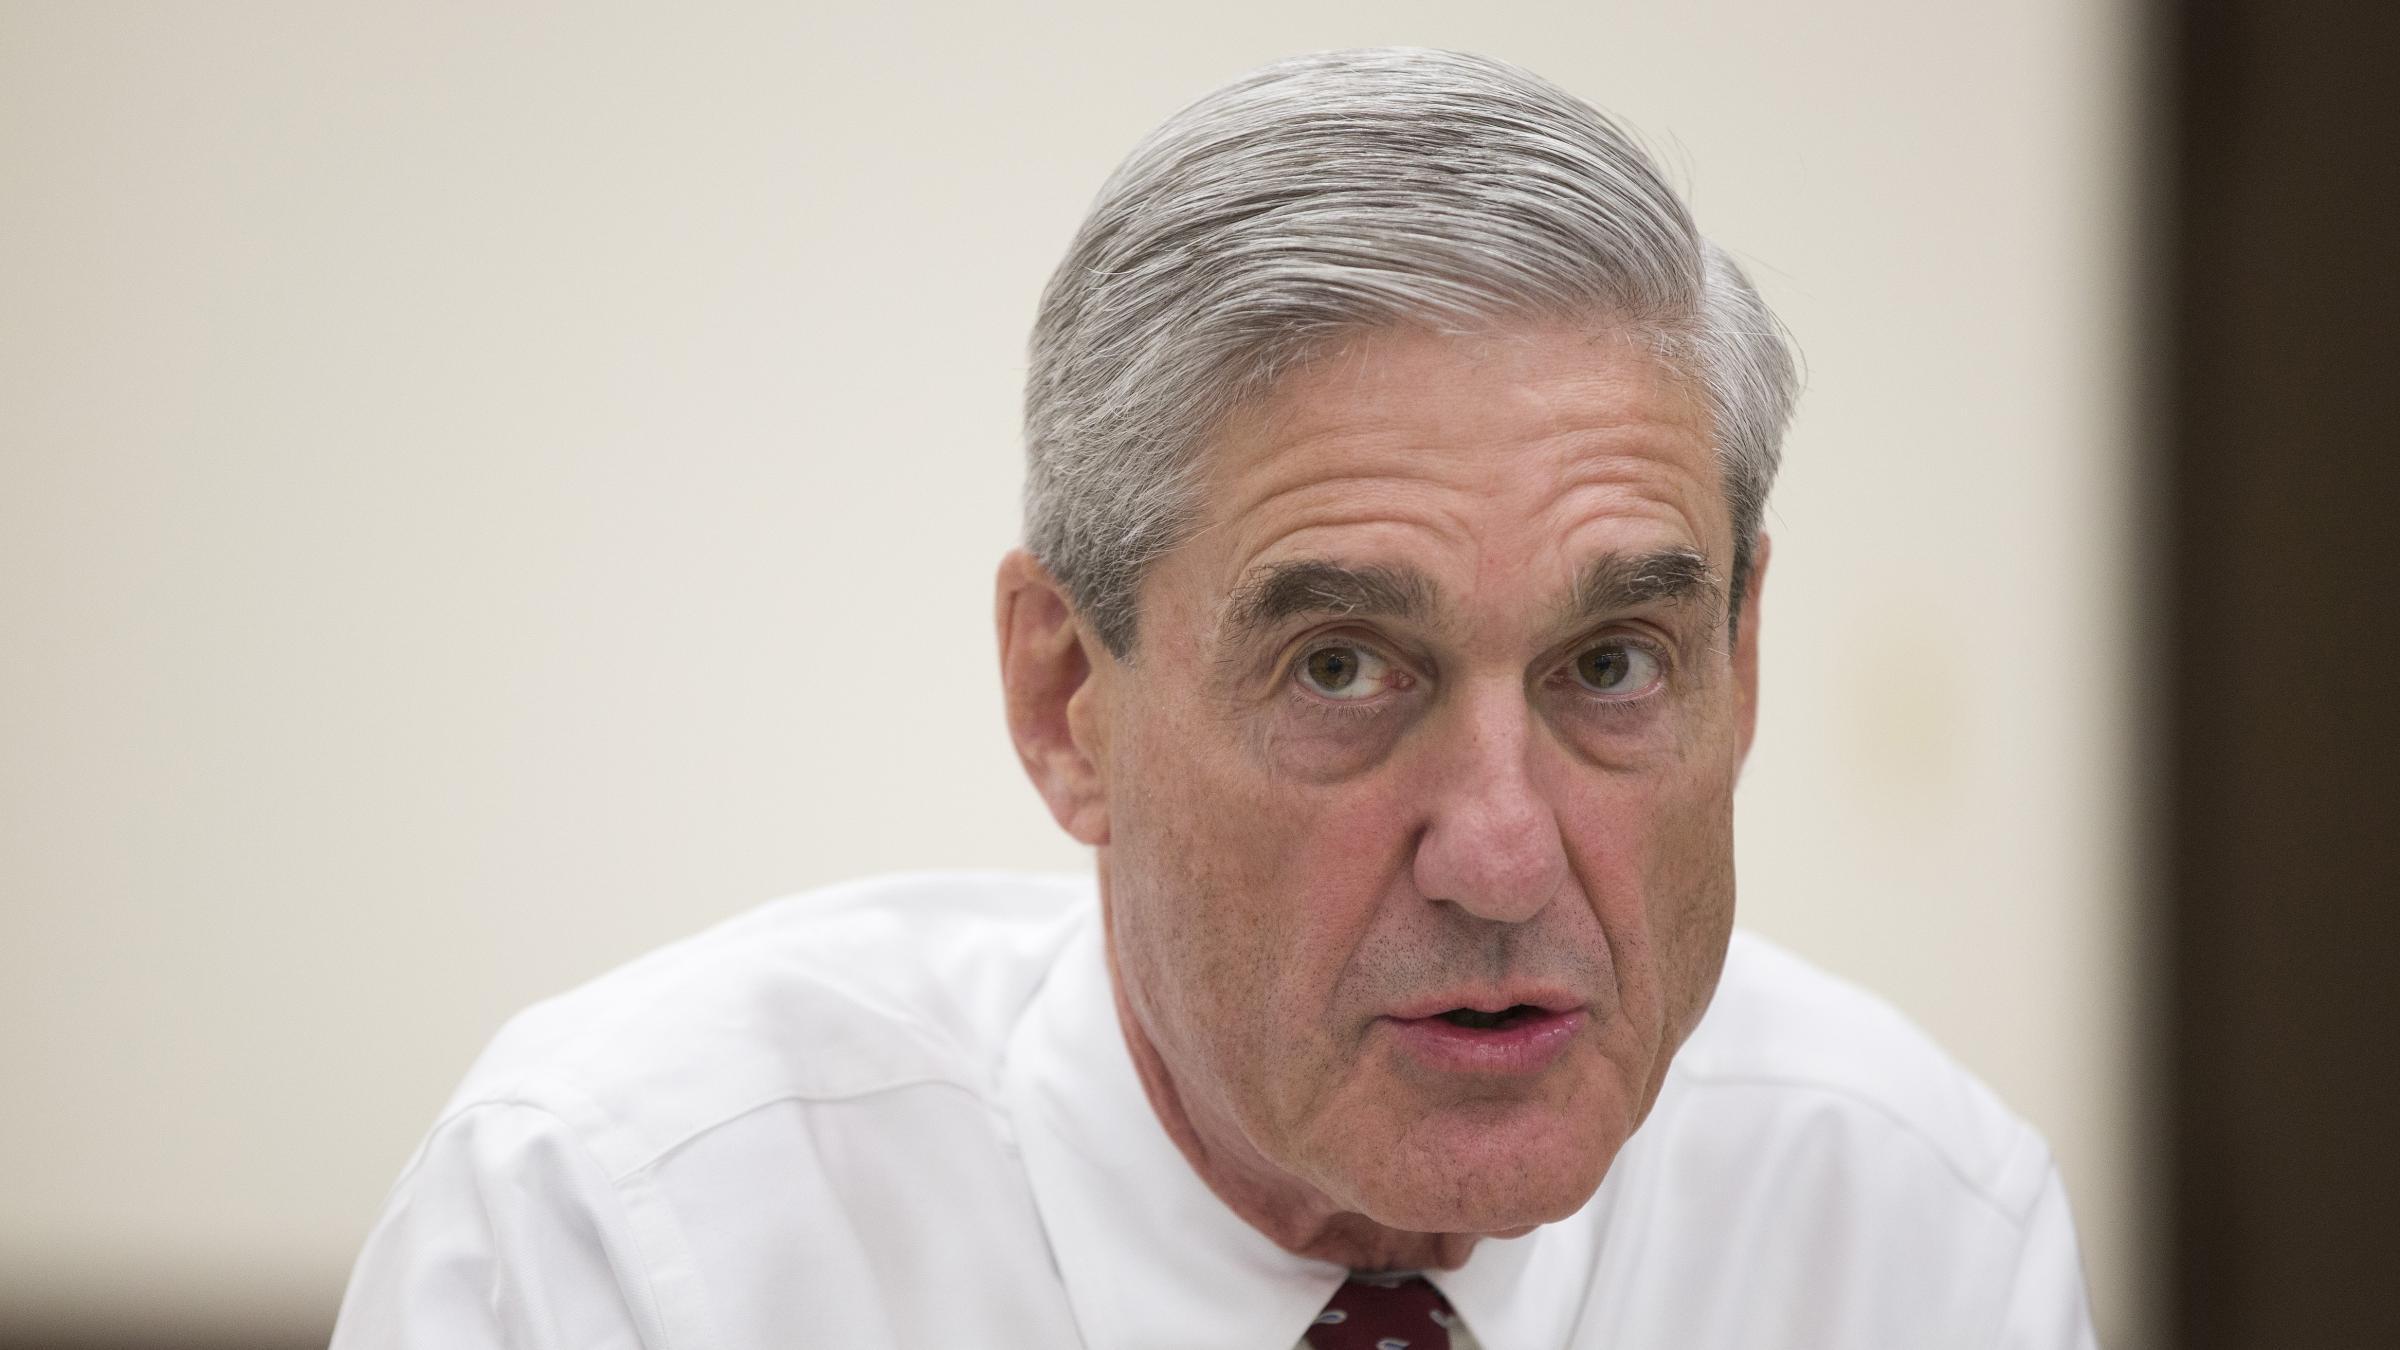 Friend says Trump is considering 'terminating' Mueller